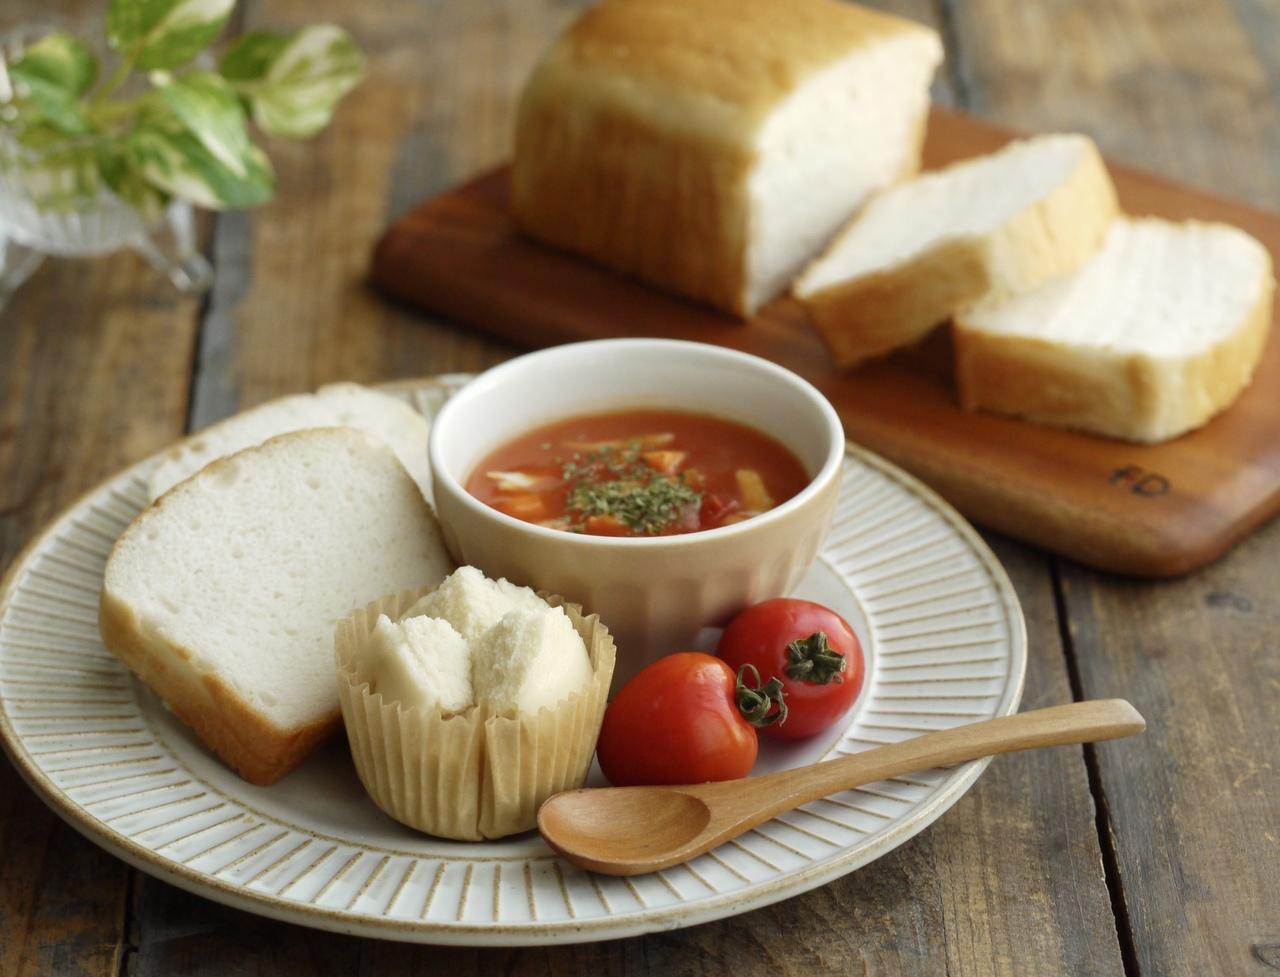 【 Comeconocoオリジナル・パン用米粉のグルテンフリー食パン&蒸しパン 】